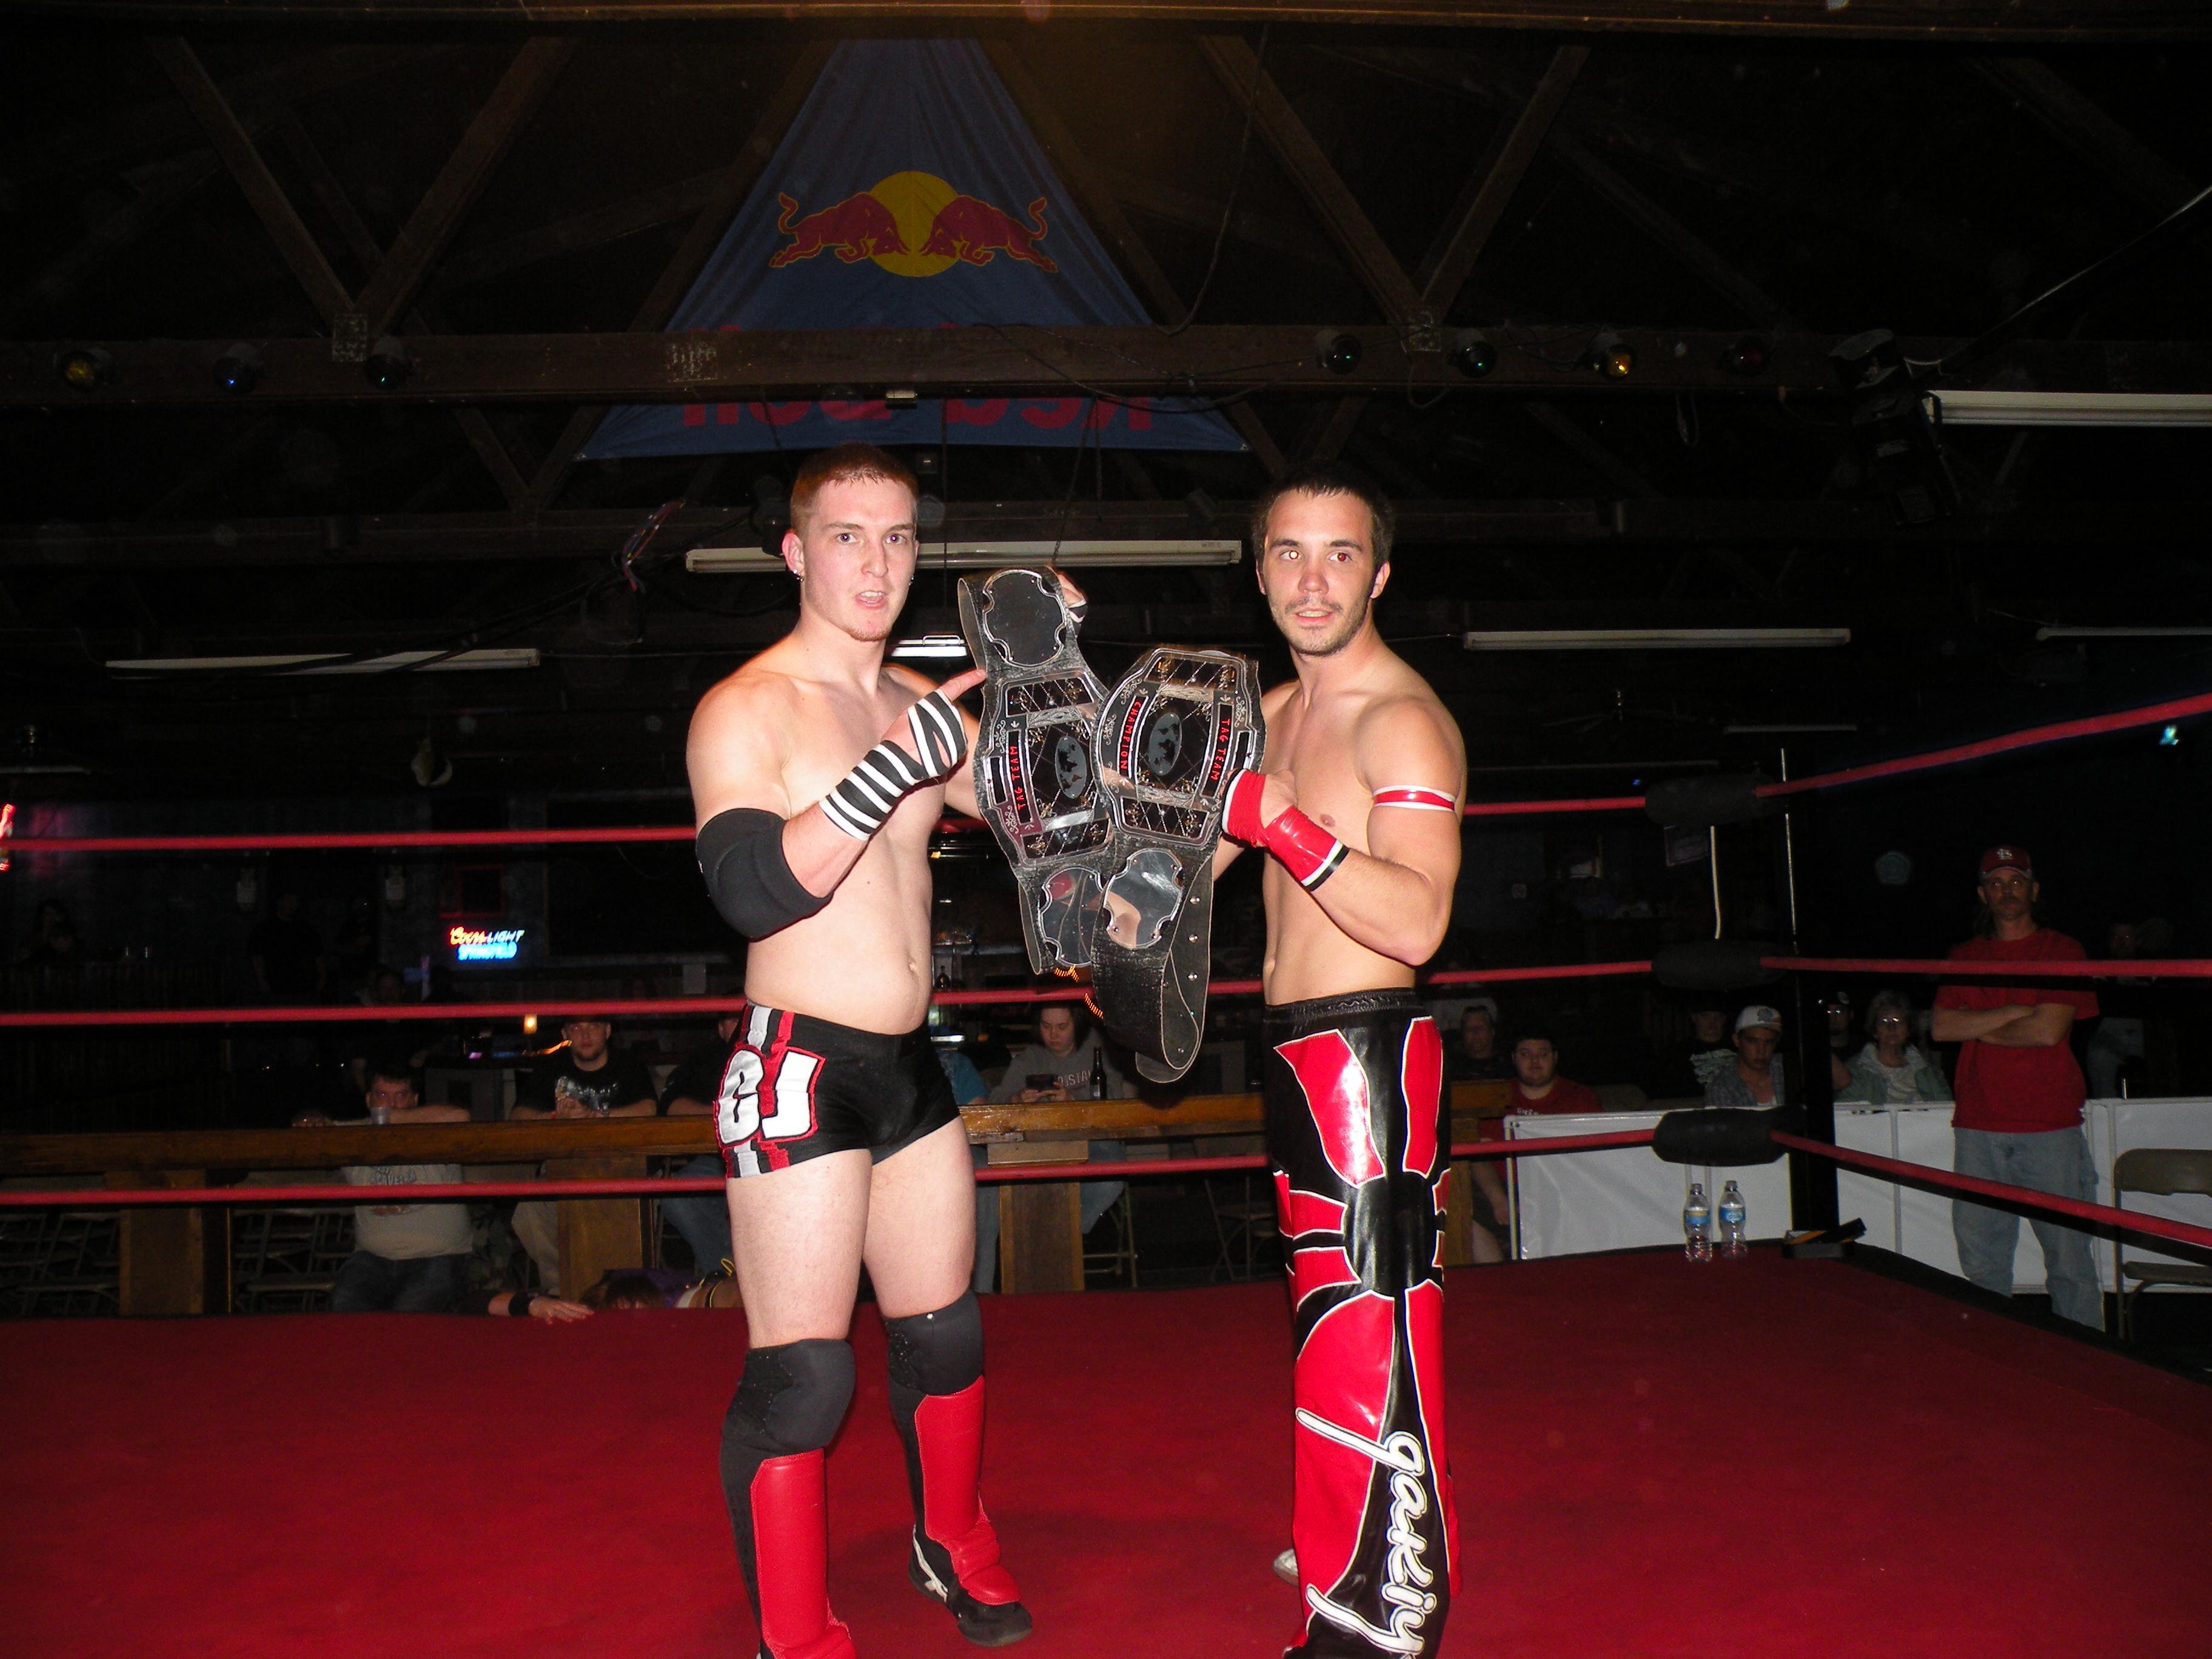 PWE Tag Team Champions Zero Gravity